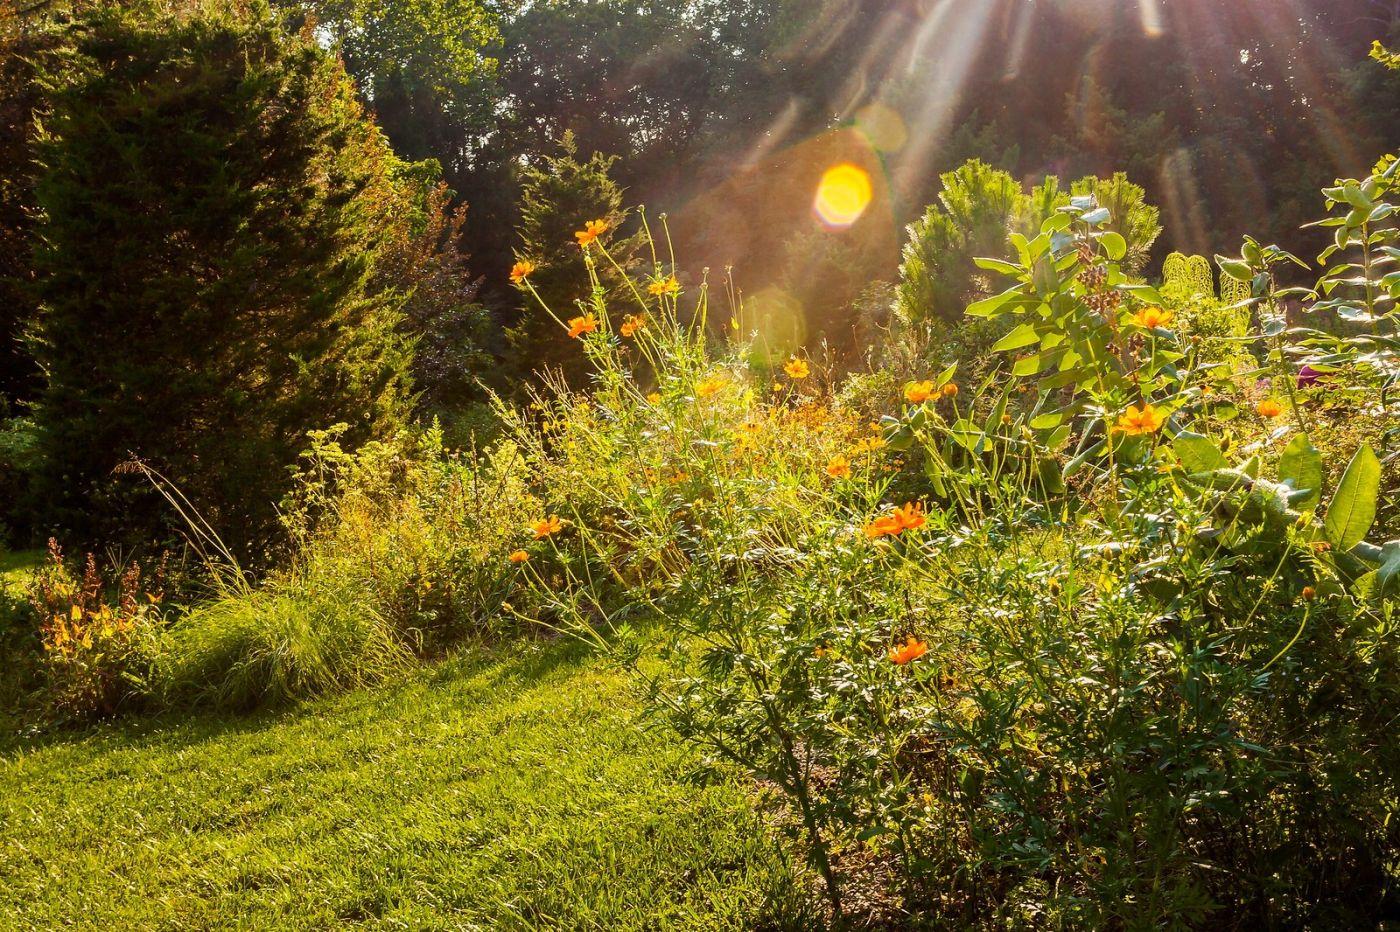 Chanticleer花园,季季有色彩_图1-29